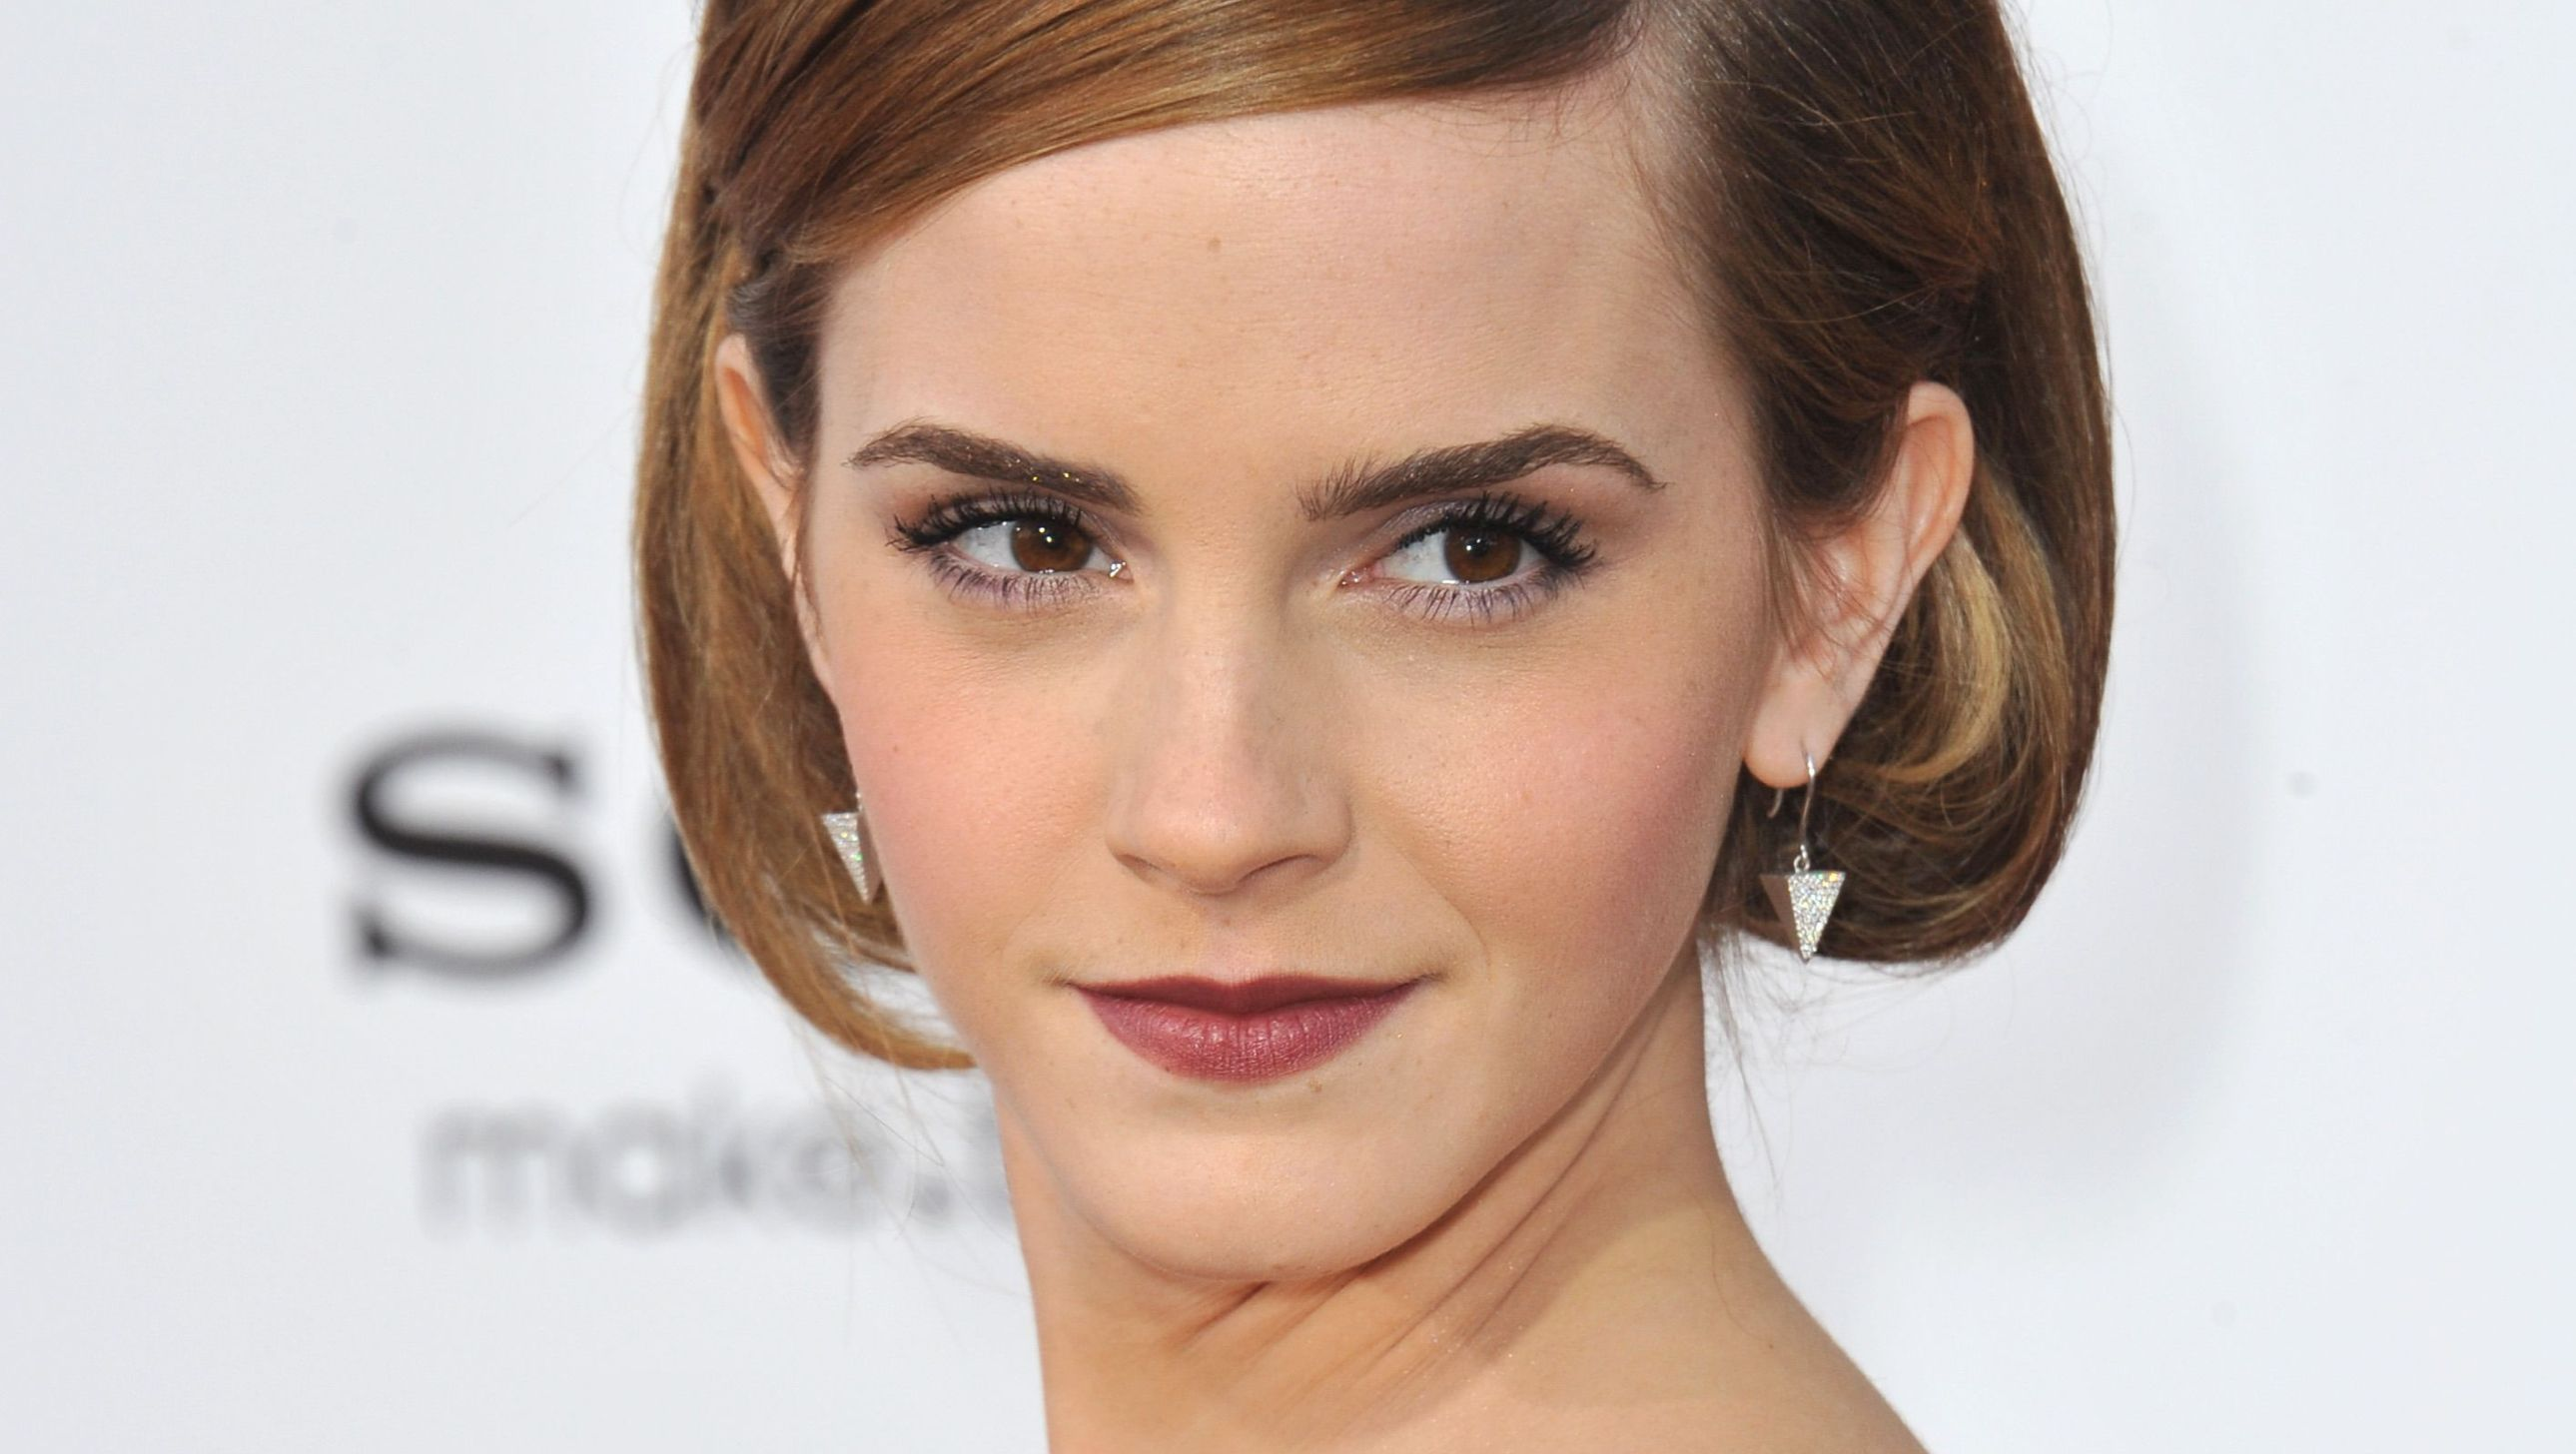 Emma Watson wears short hair and dark lipstick.